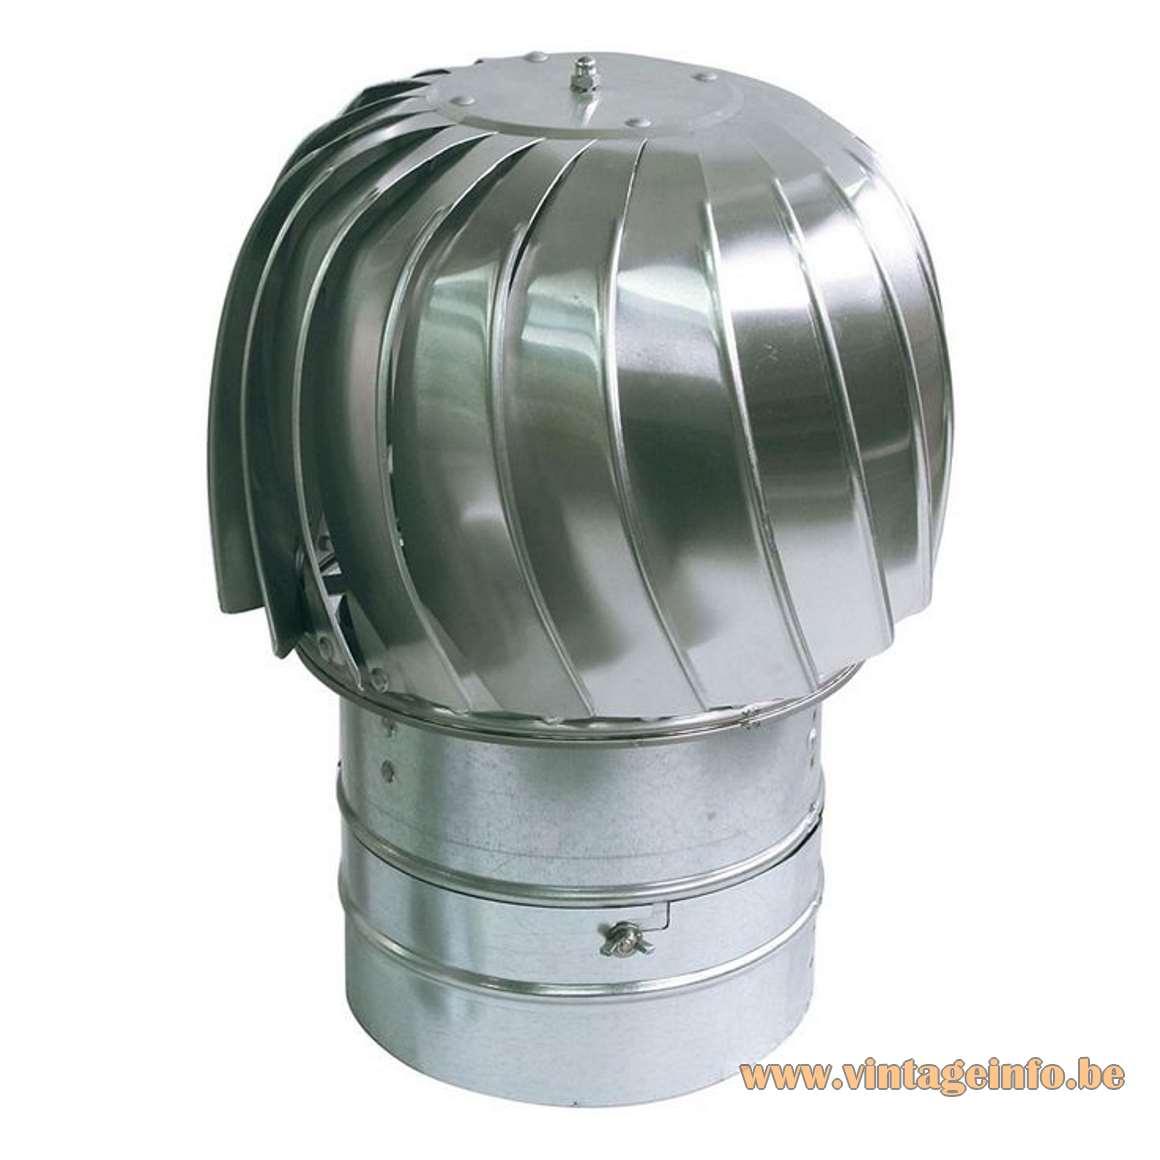 Henri Mathieu Spiral Kinetics Style Pendant Lamp - Chimney Cap